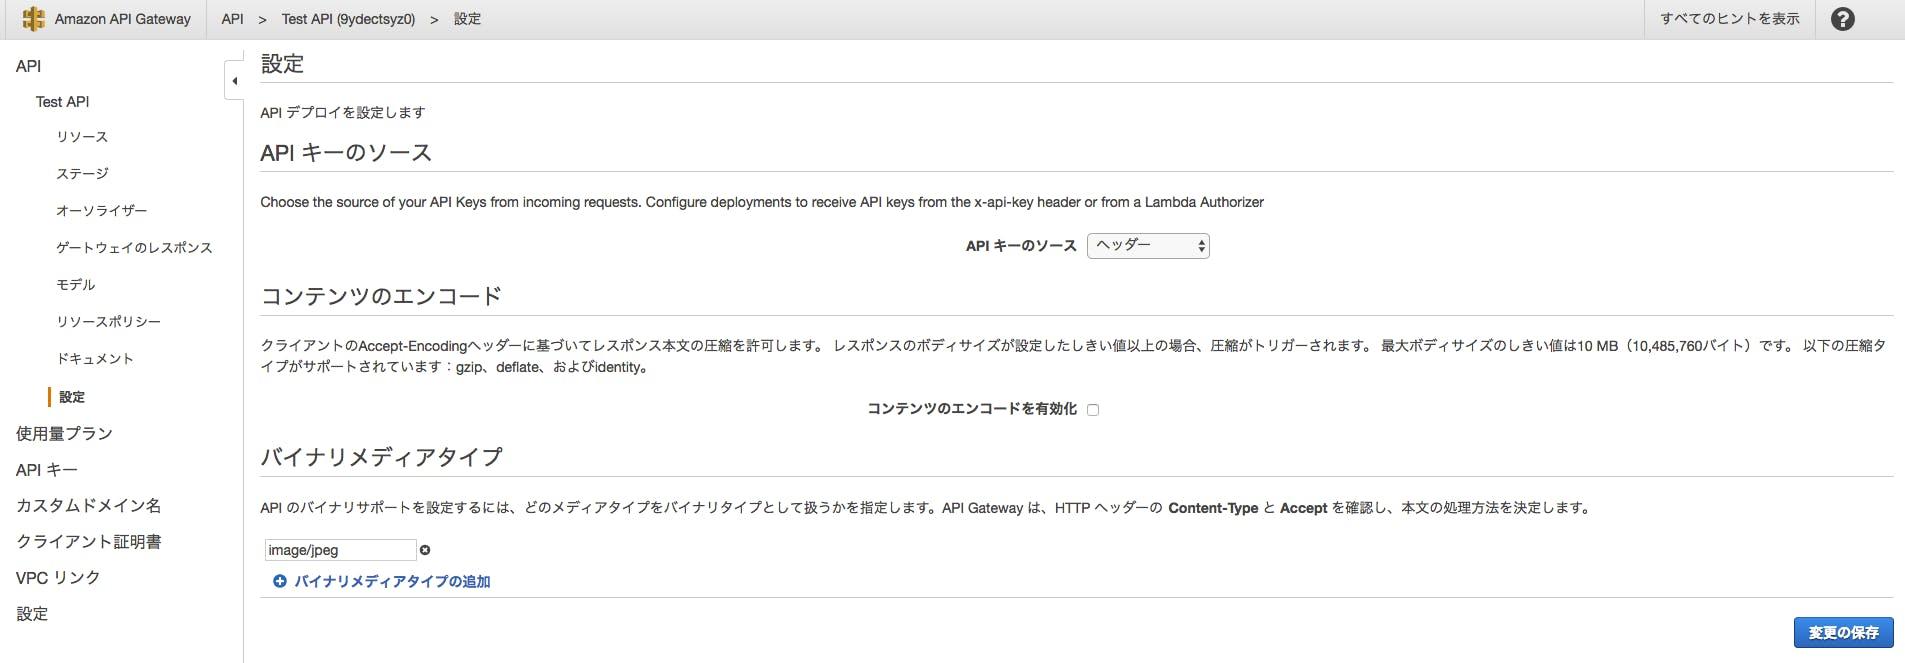 Api Gateway Request Authorizer